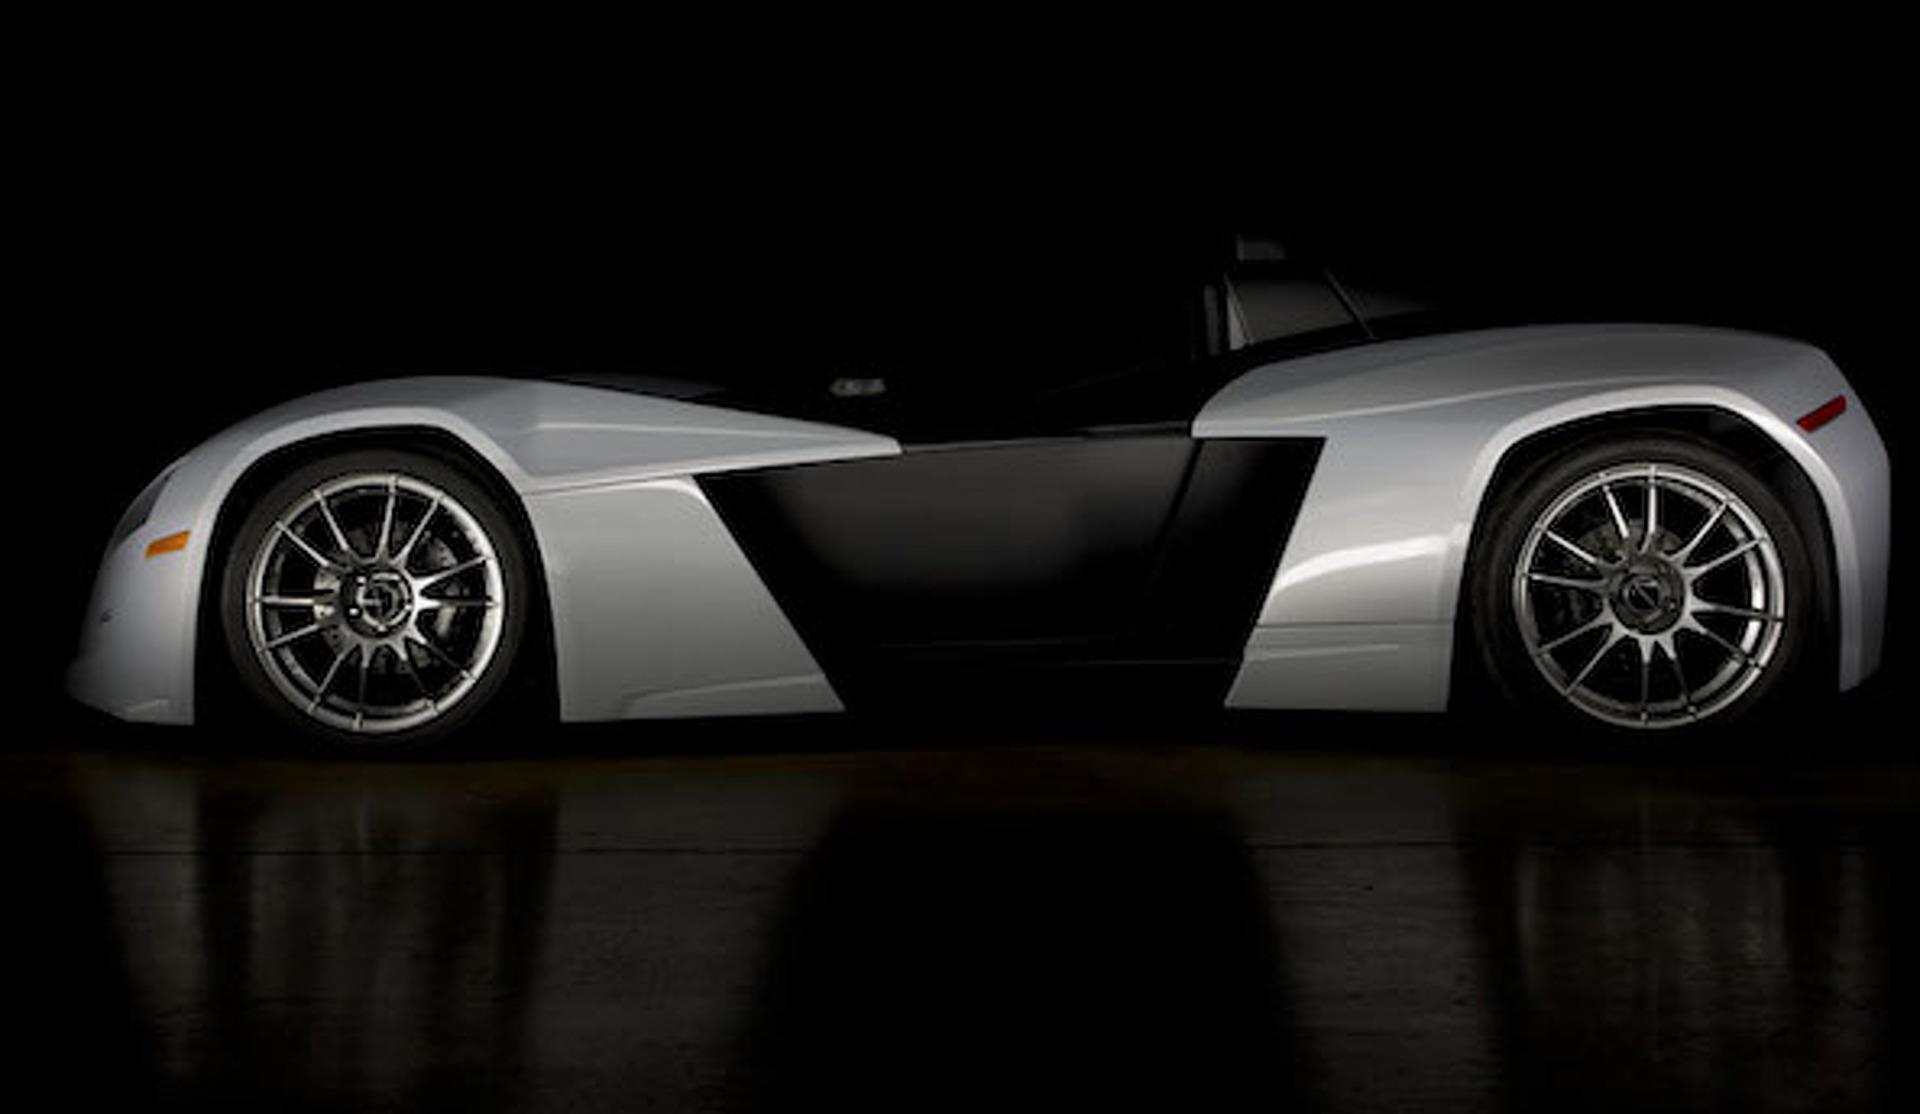 Magnum MK5 Track Car Makes World Debut in South Florida